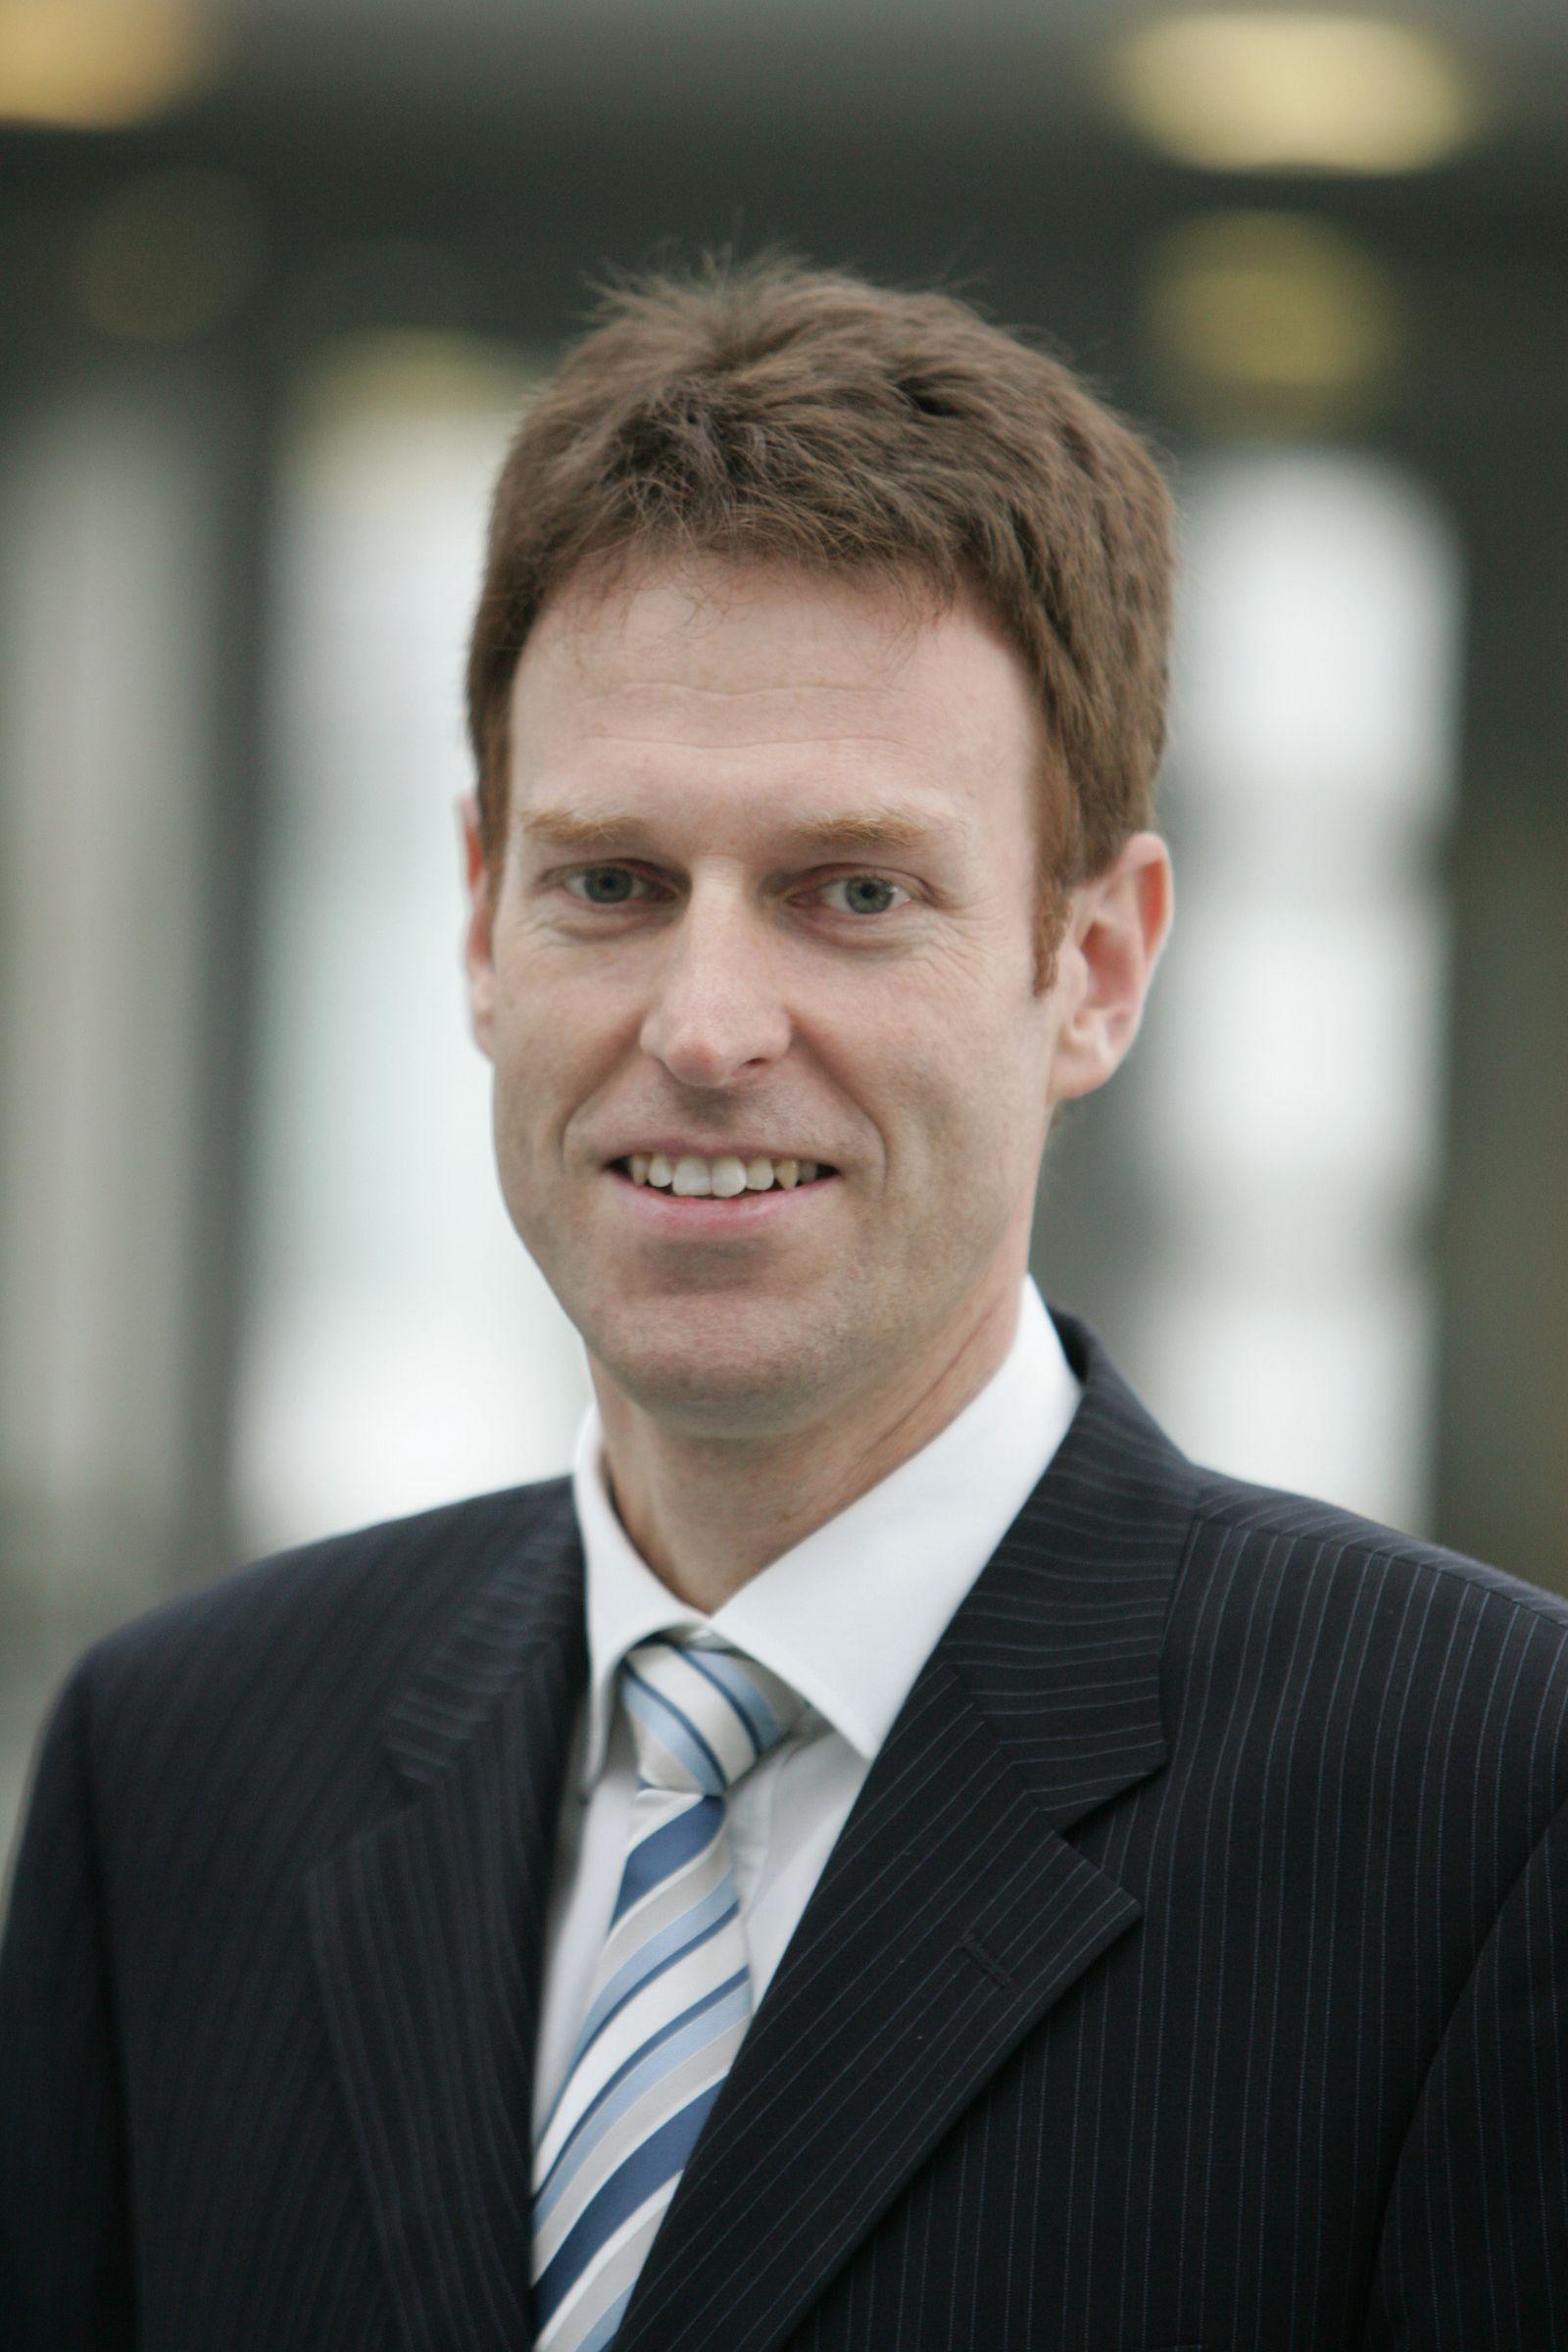 Thomas Dannenfeldt